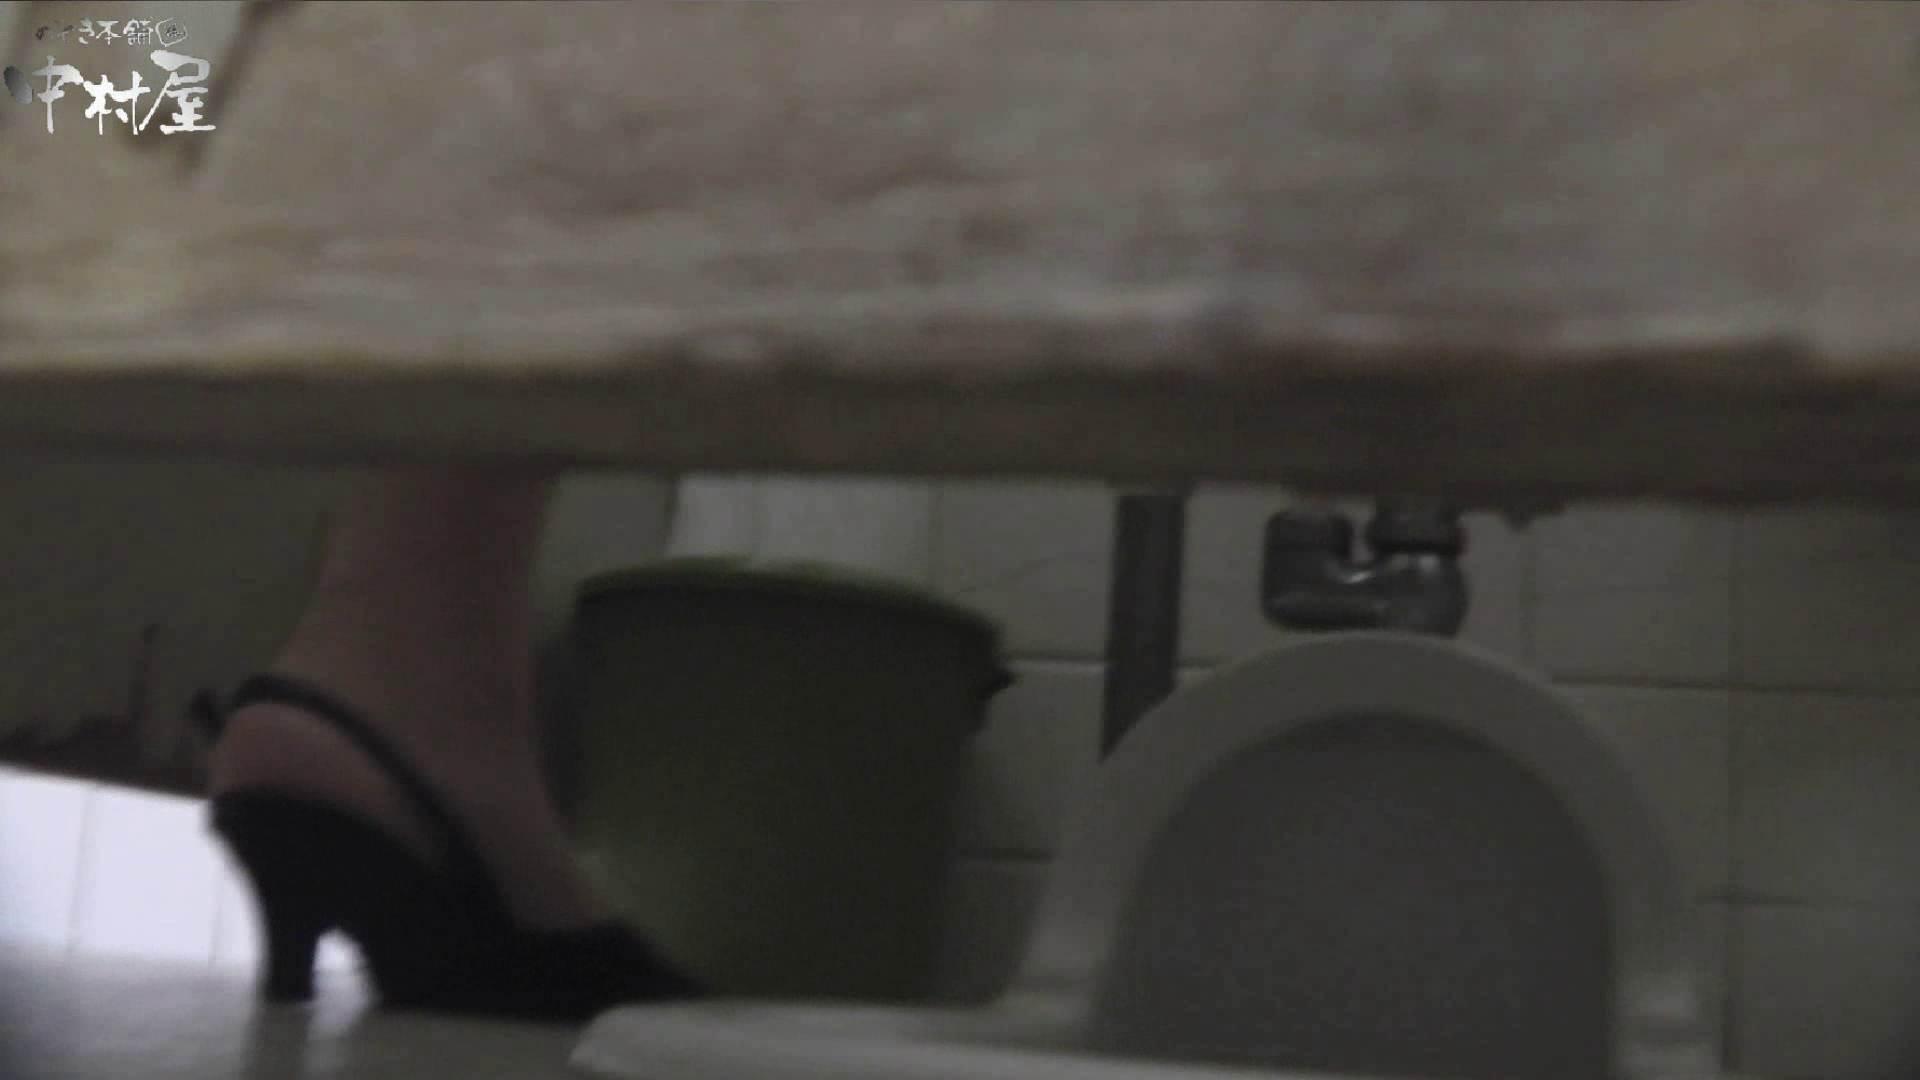 vol.41 命がけ潜伏洗面所! 毛薄め・硬度並・推定250g OLエロ画像 盗撮アダルト動画キャプチャ 89PICs 14